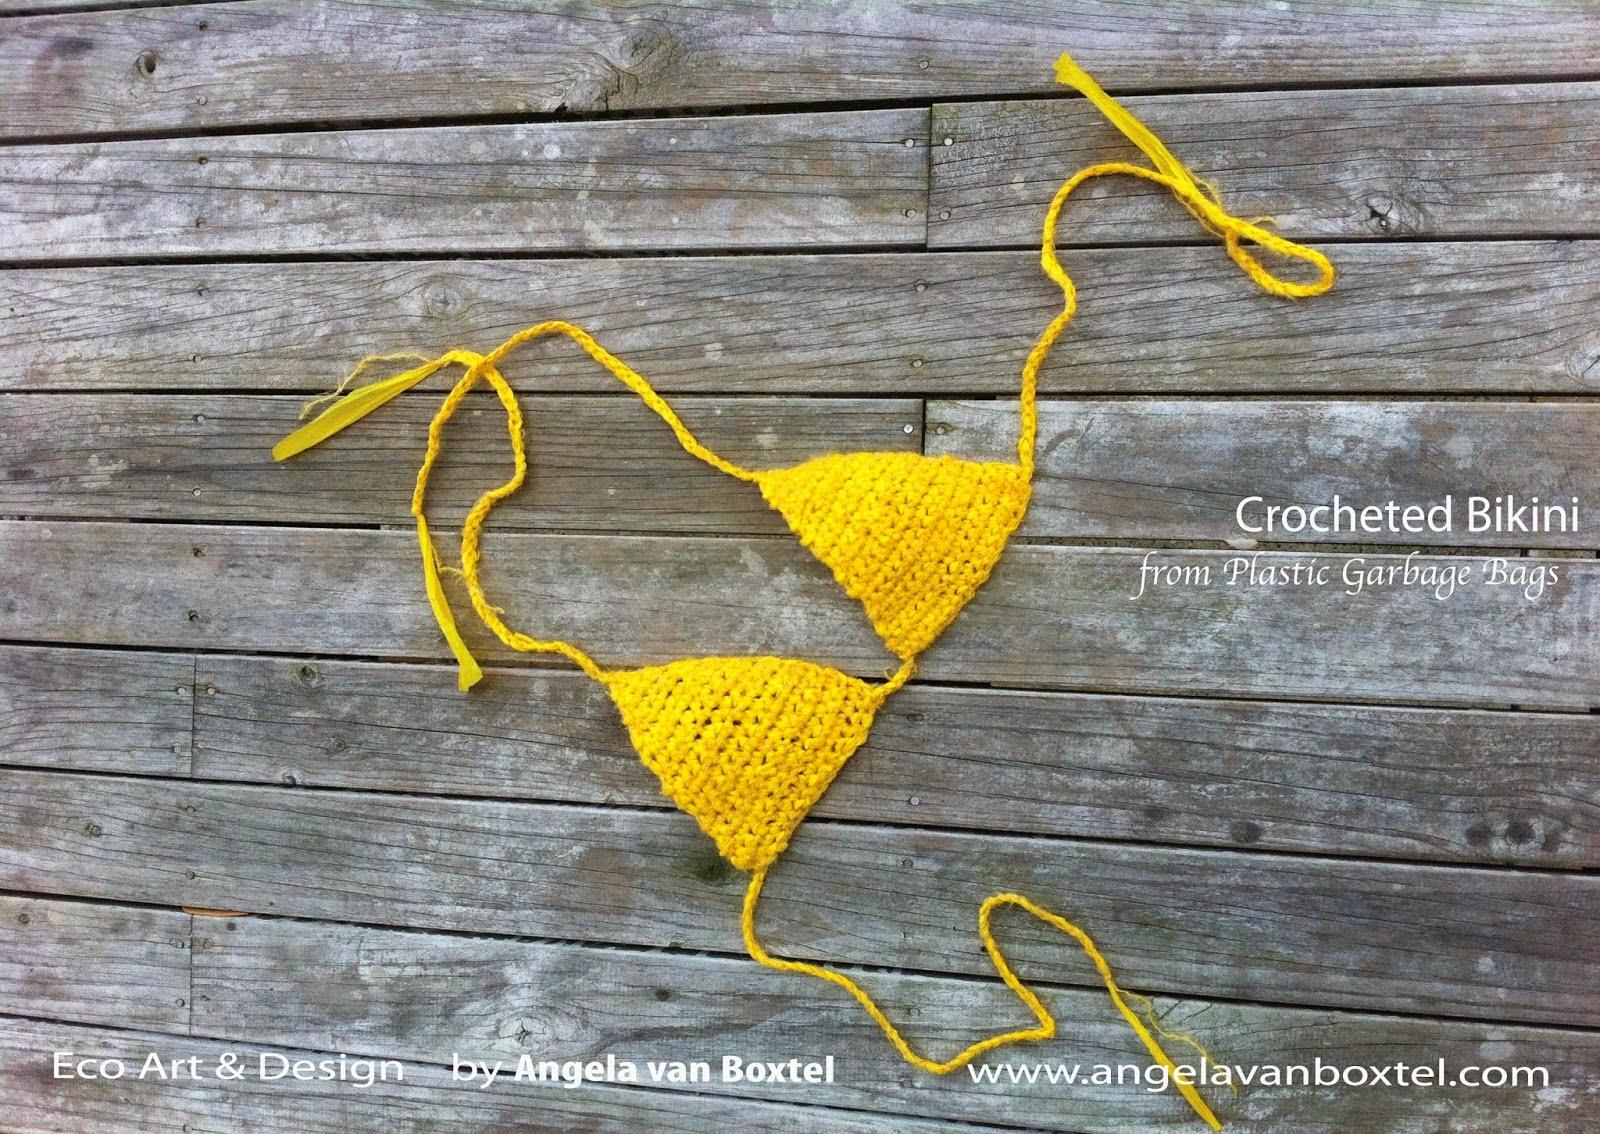 Angela_van_Boxtel_crochet_bikini6